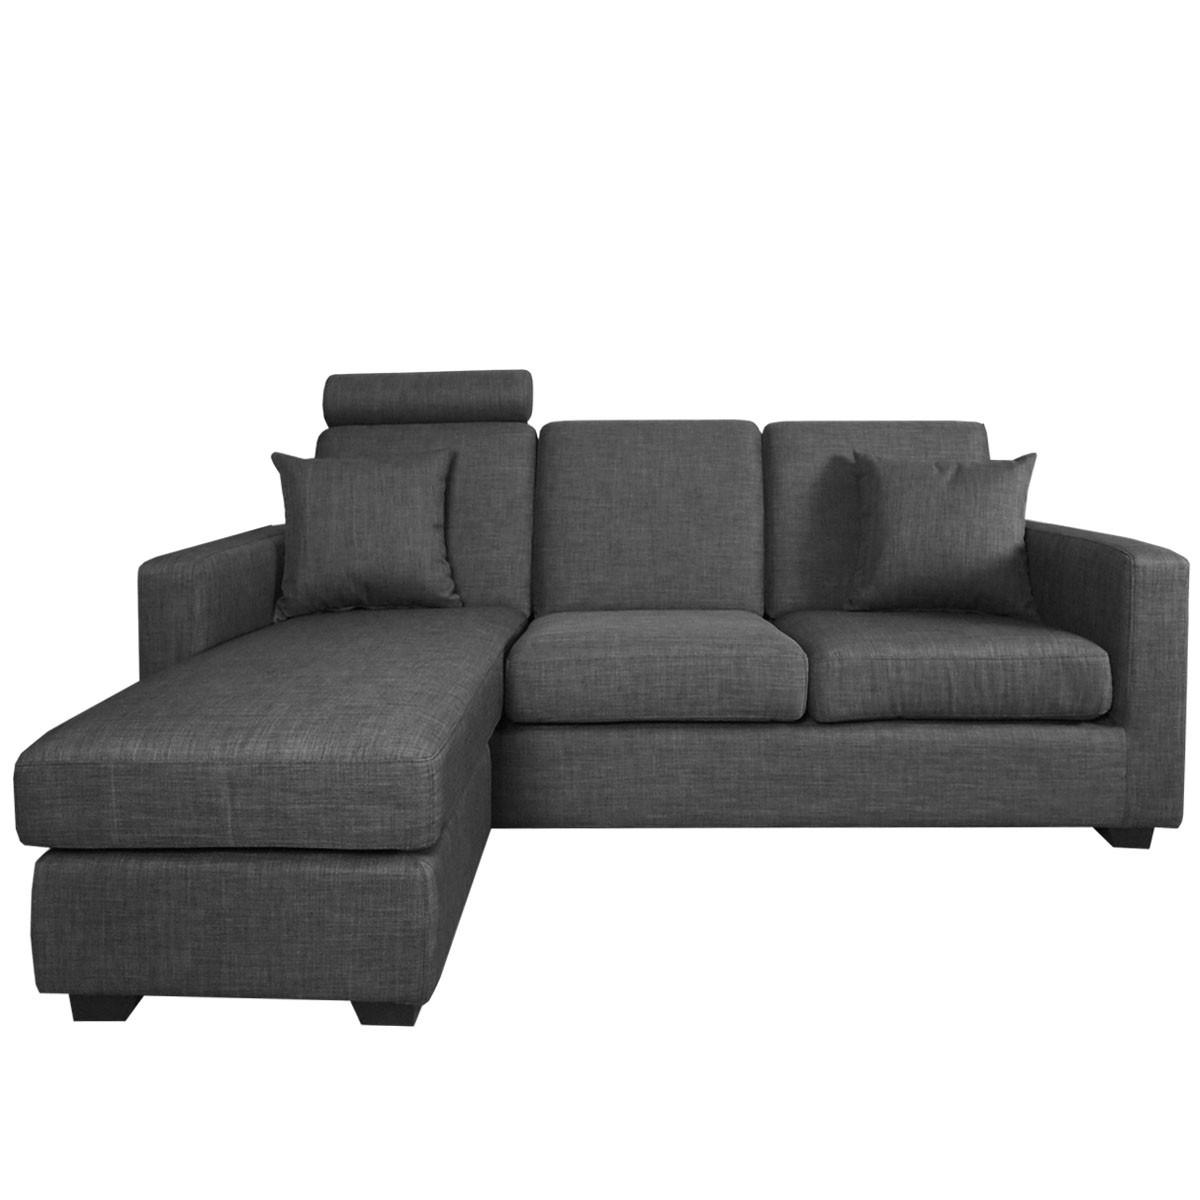 Richmond Sofas Pertaining To Most Popular Richmond Sofa Grey (View 9 of 15)